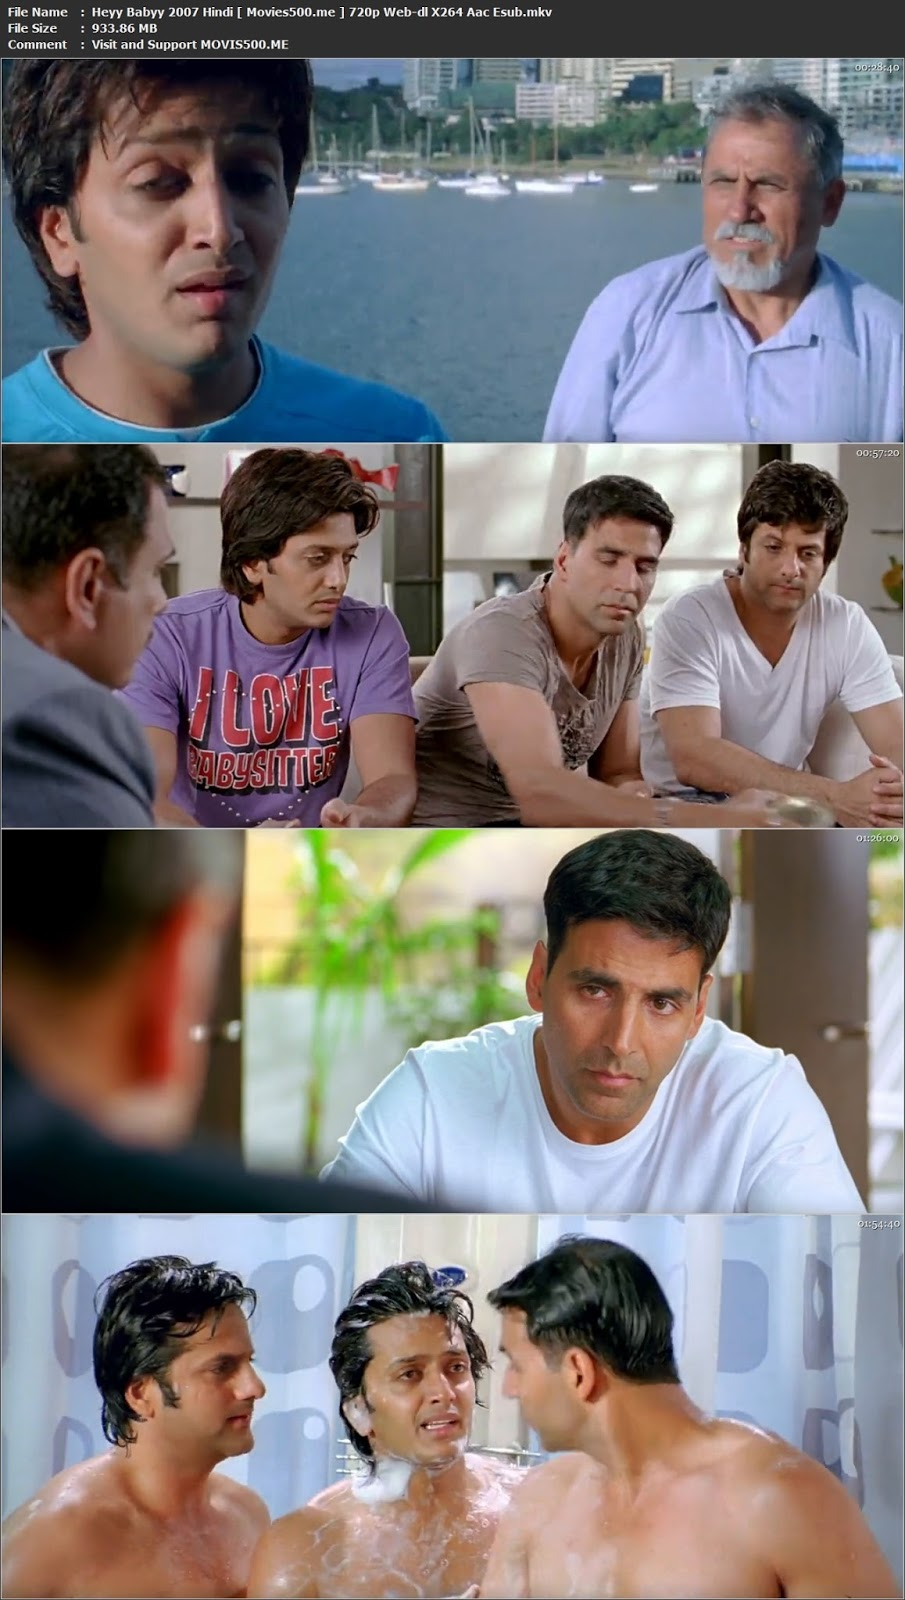 Heyy Babyy 2007 Hindi Full Movie 900MB 720p WEB DL at gencoalumni.info